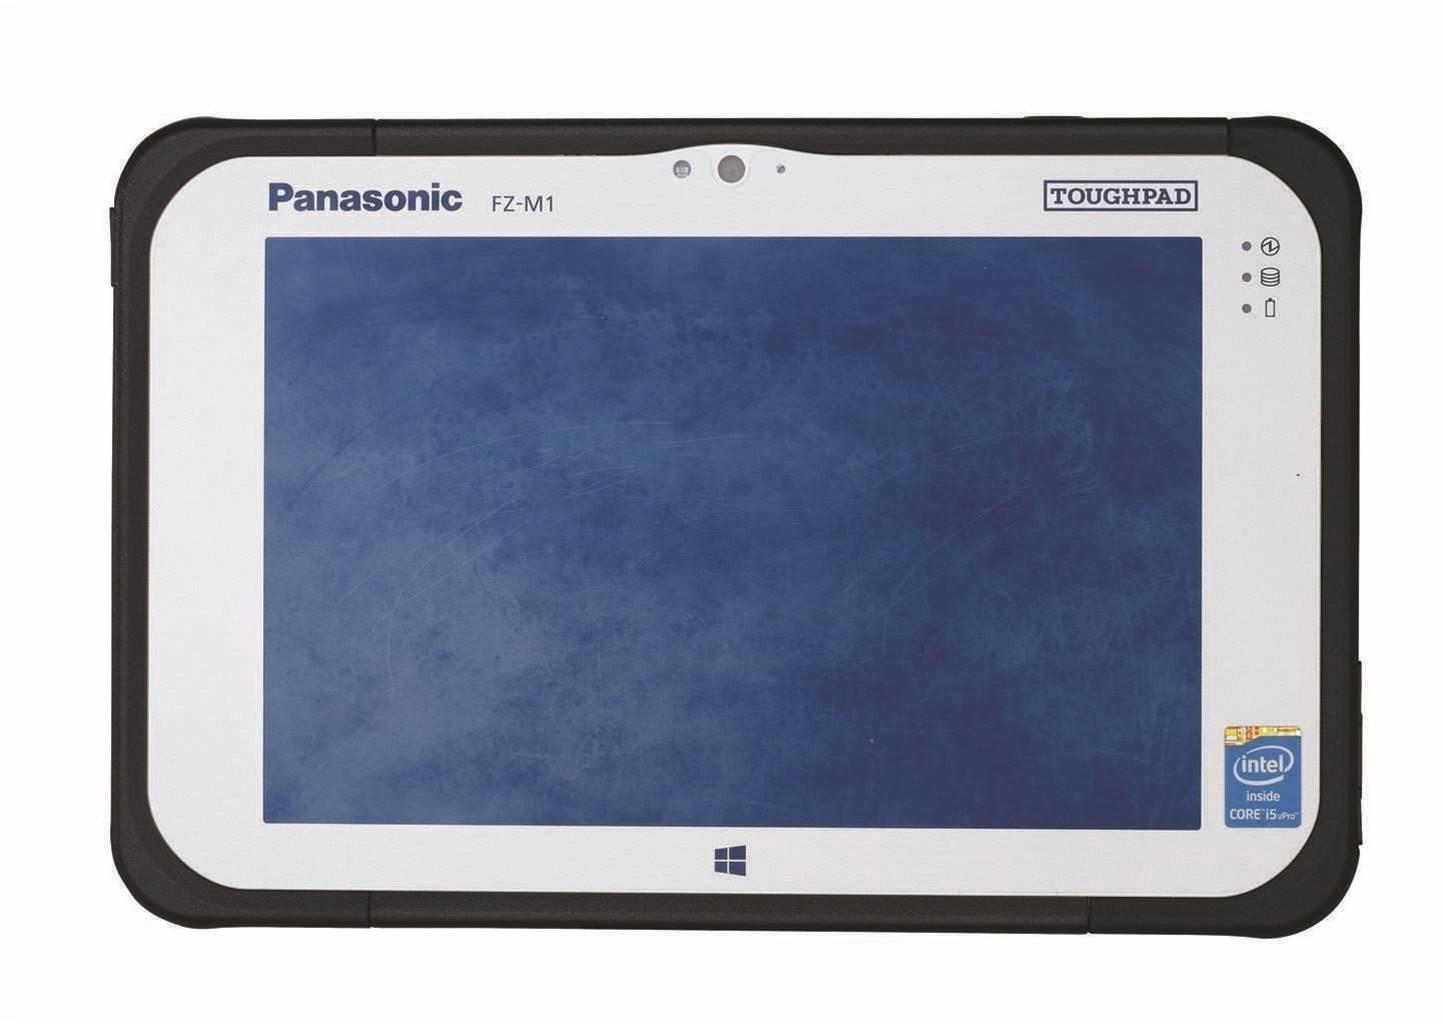 Review: Panasonic Toughpad FZ-M1